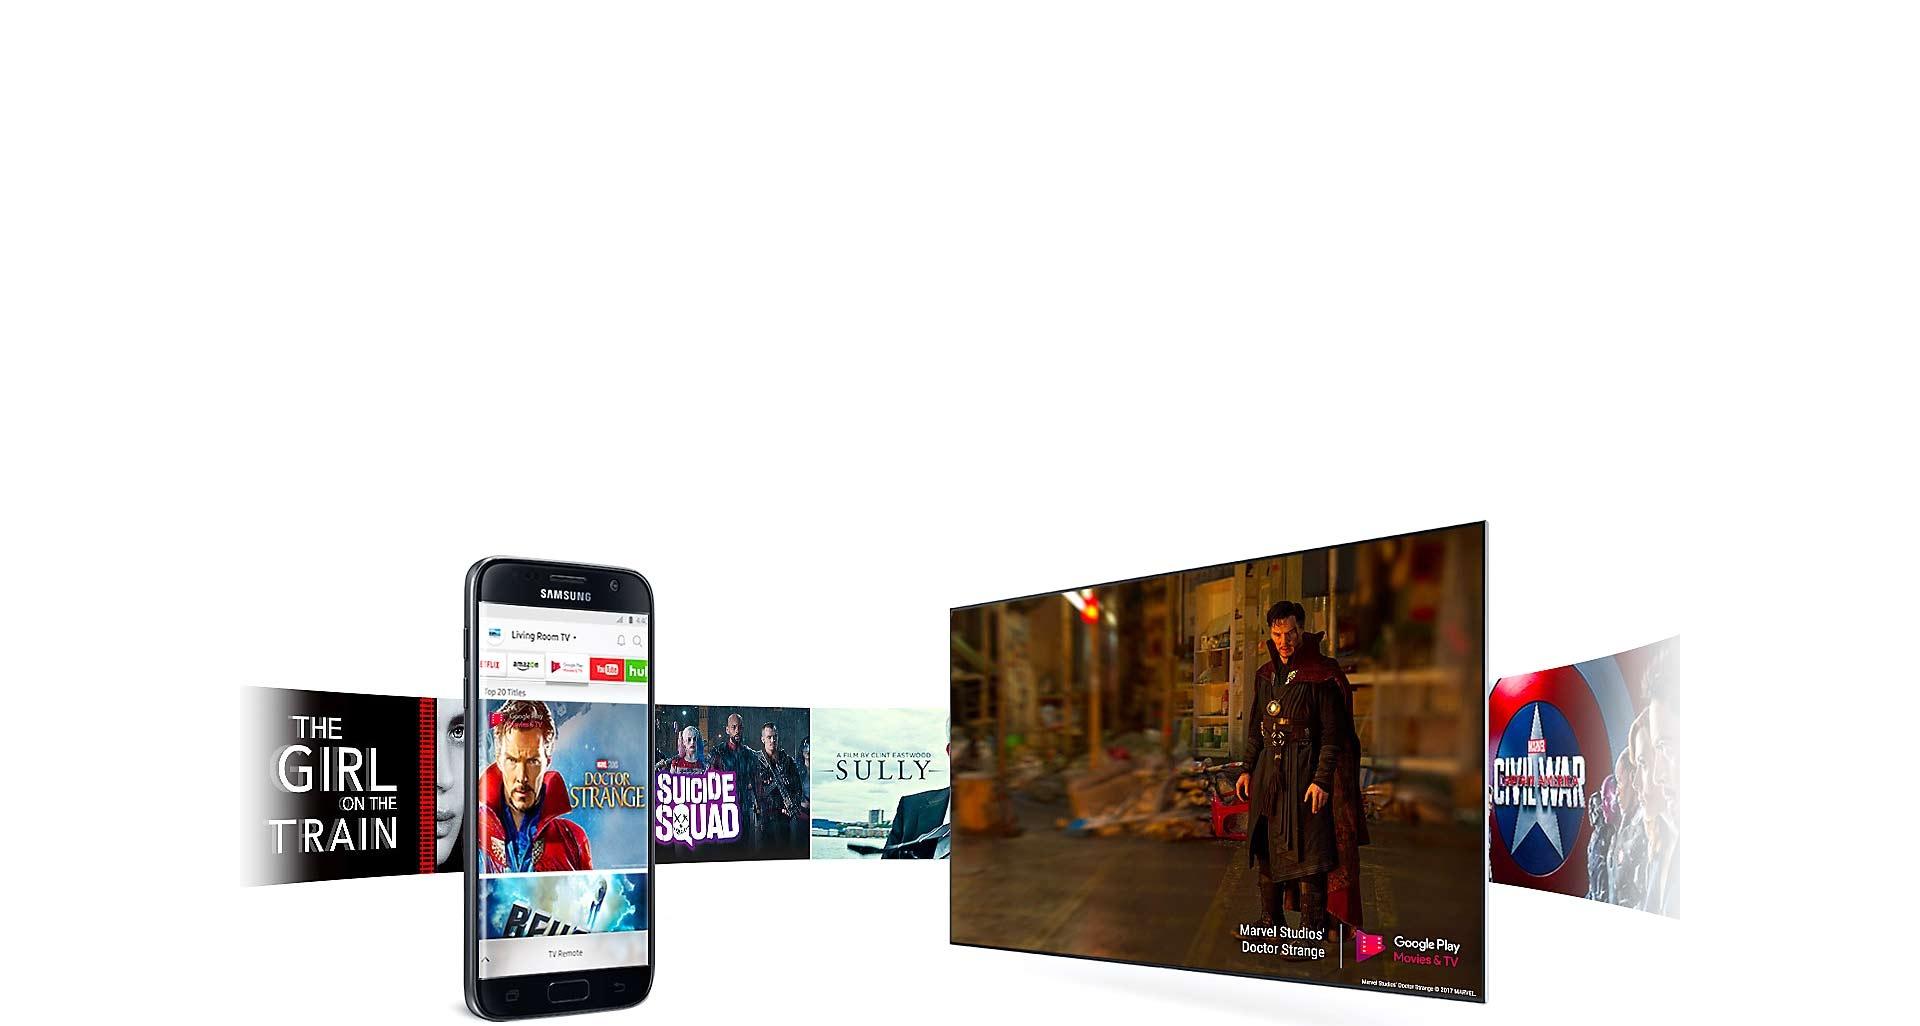 تلویزیون 49 اینچی سری 6 سامسونگ با ویژگی Smart View